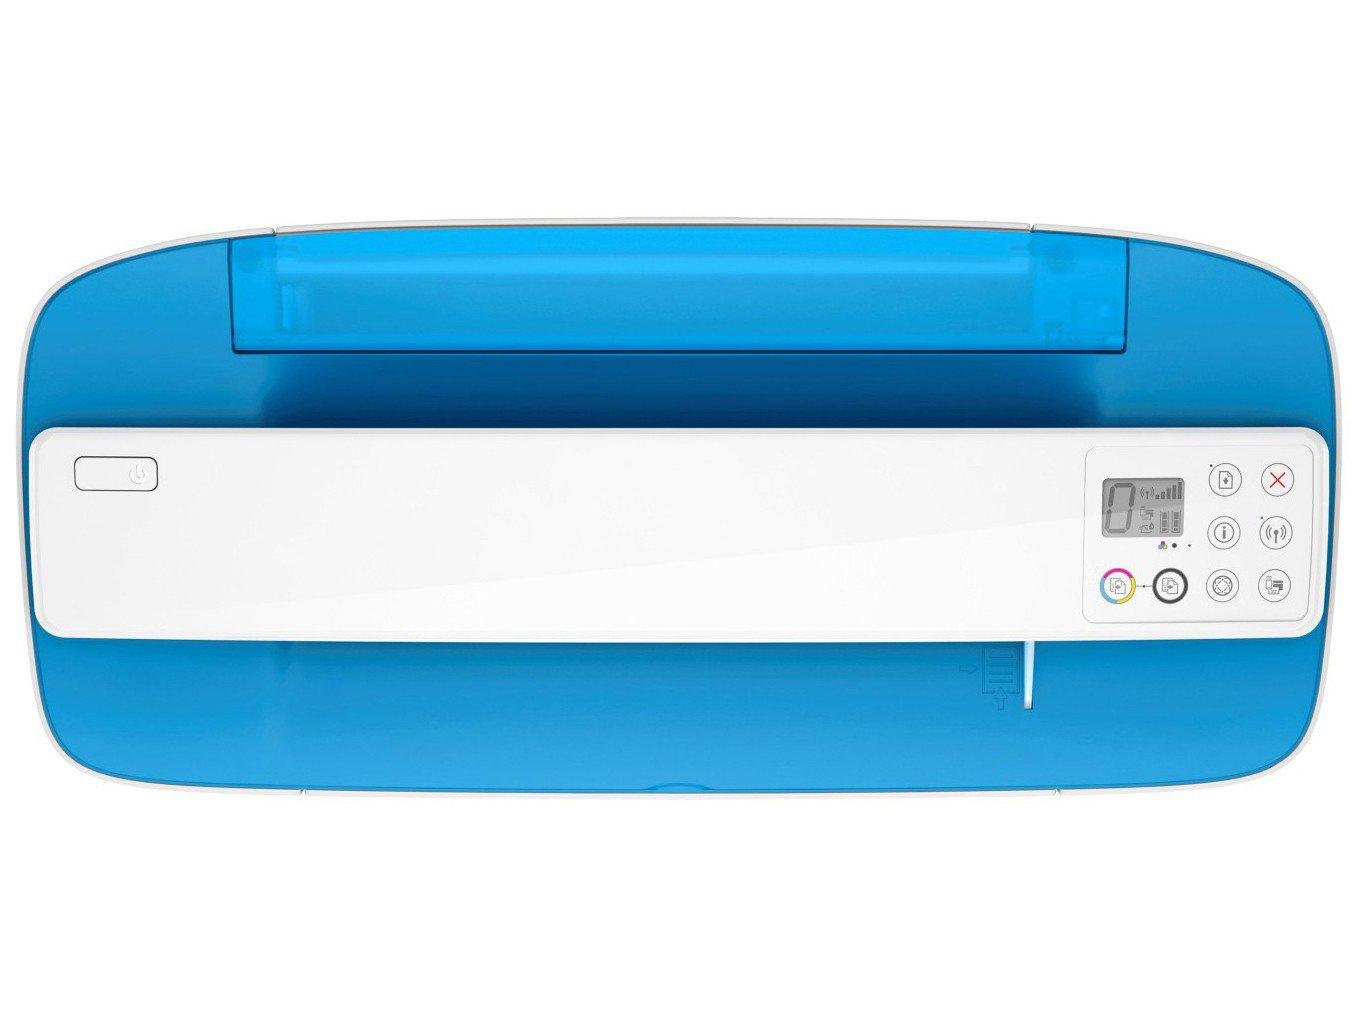 Foto 11 - Multifuncional HP DeskJet Ink Advantage 3776 - Jato de Tinta Display LCD Wi-Fi